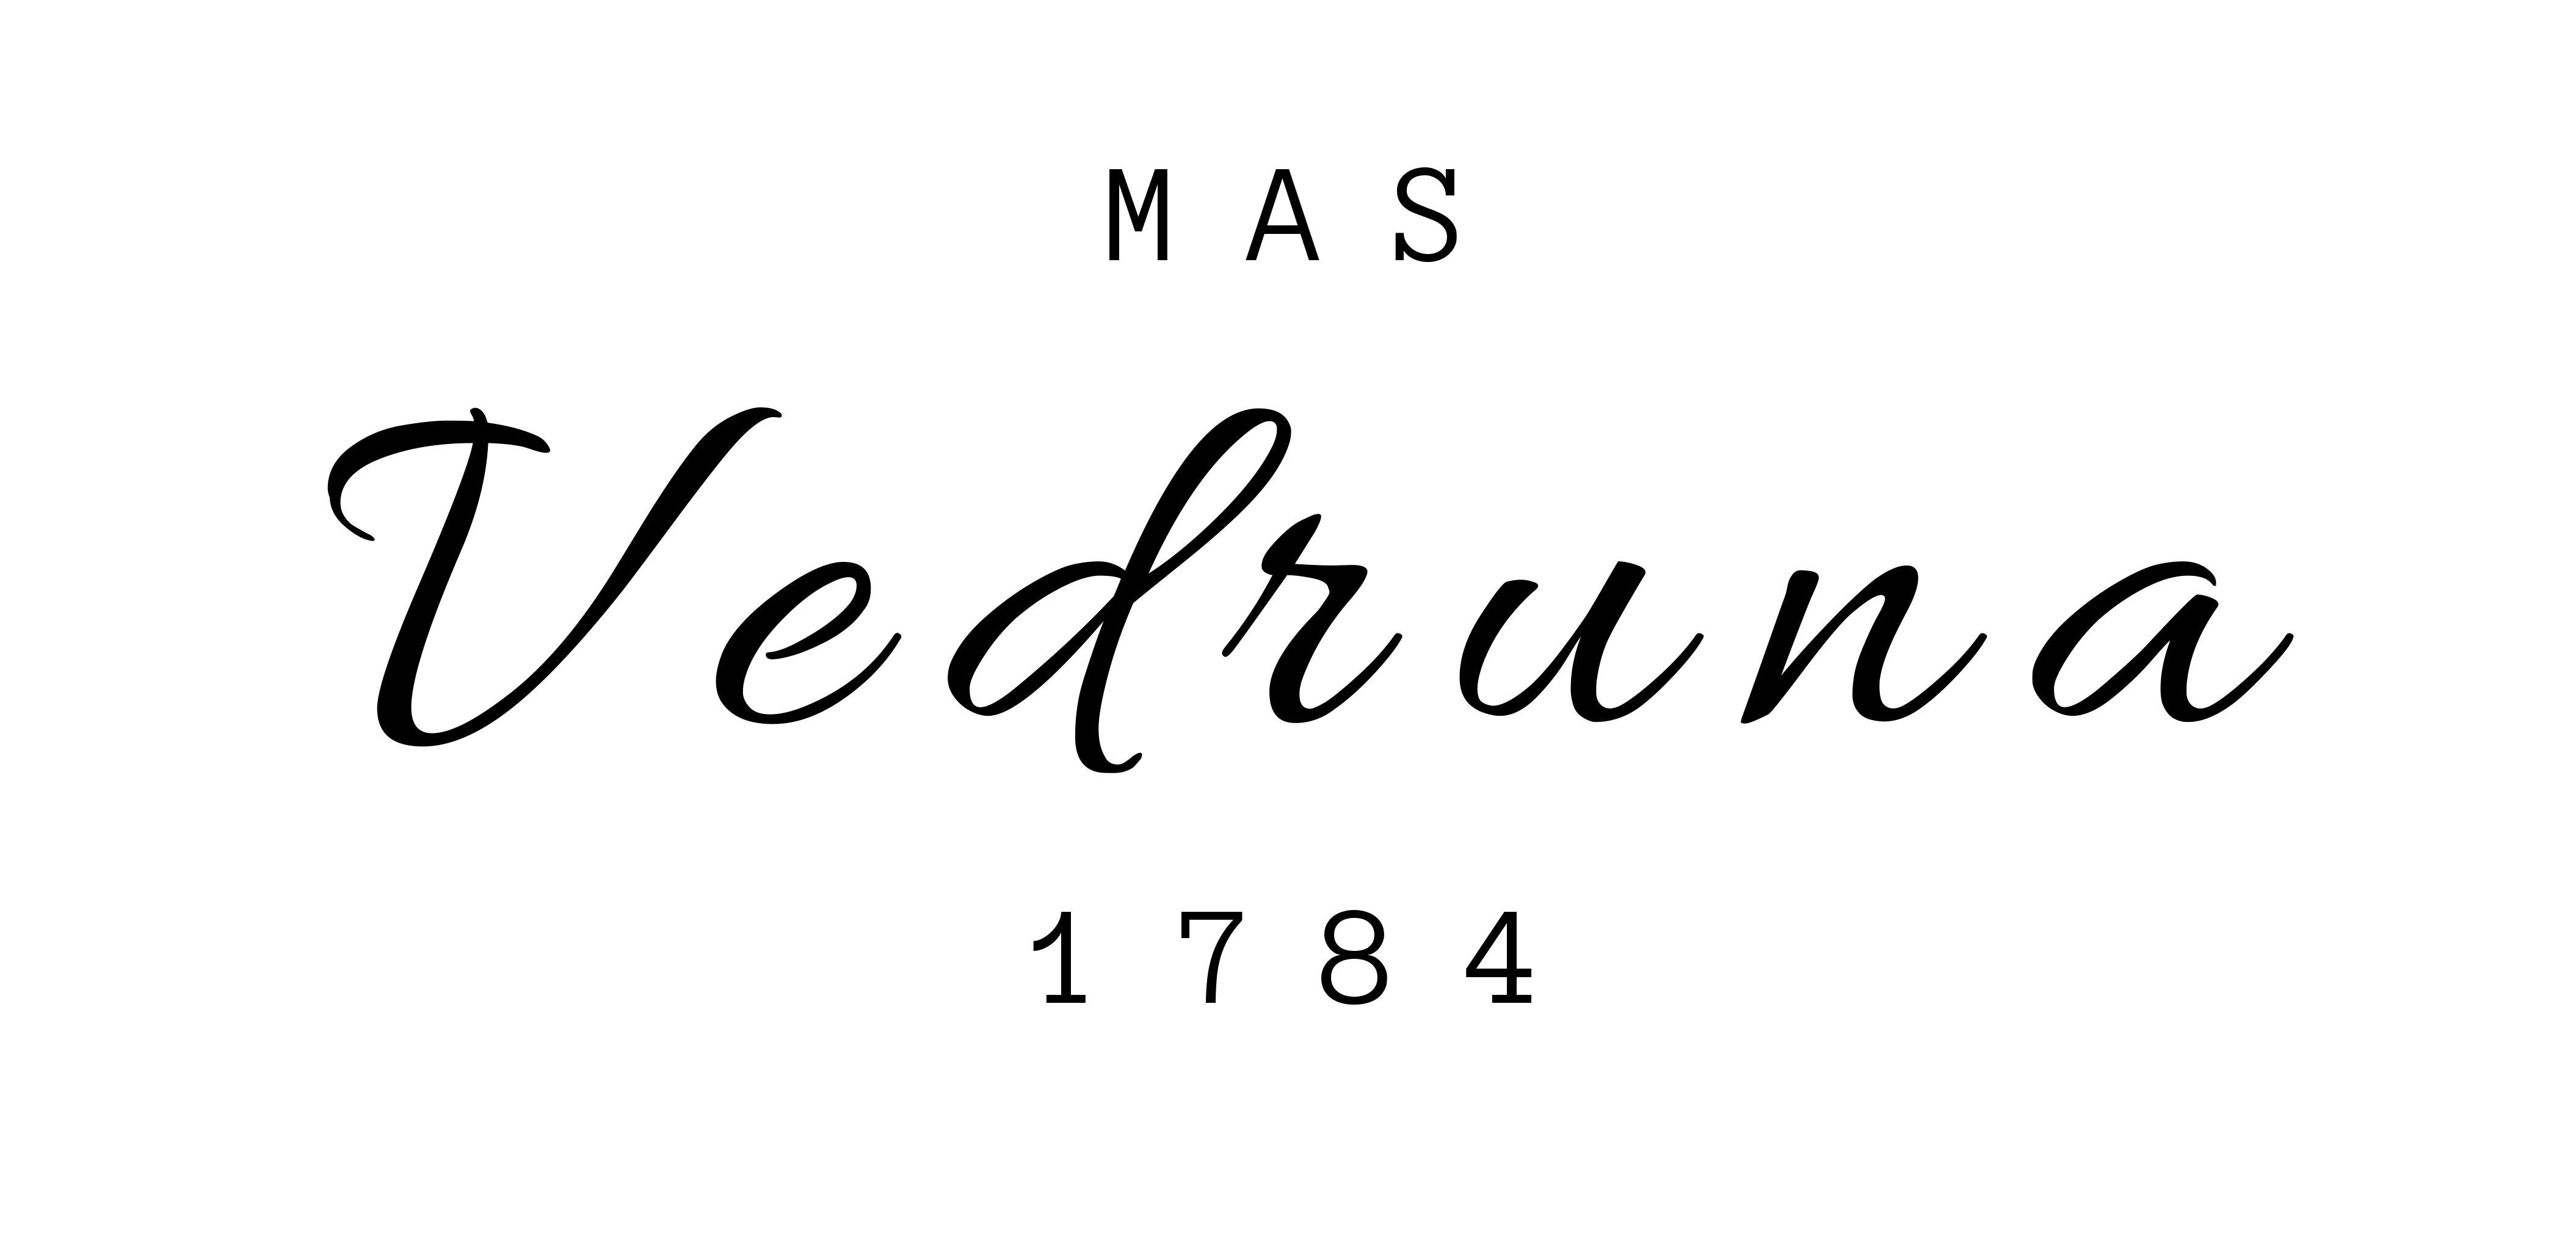 Mas Vedruna